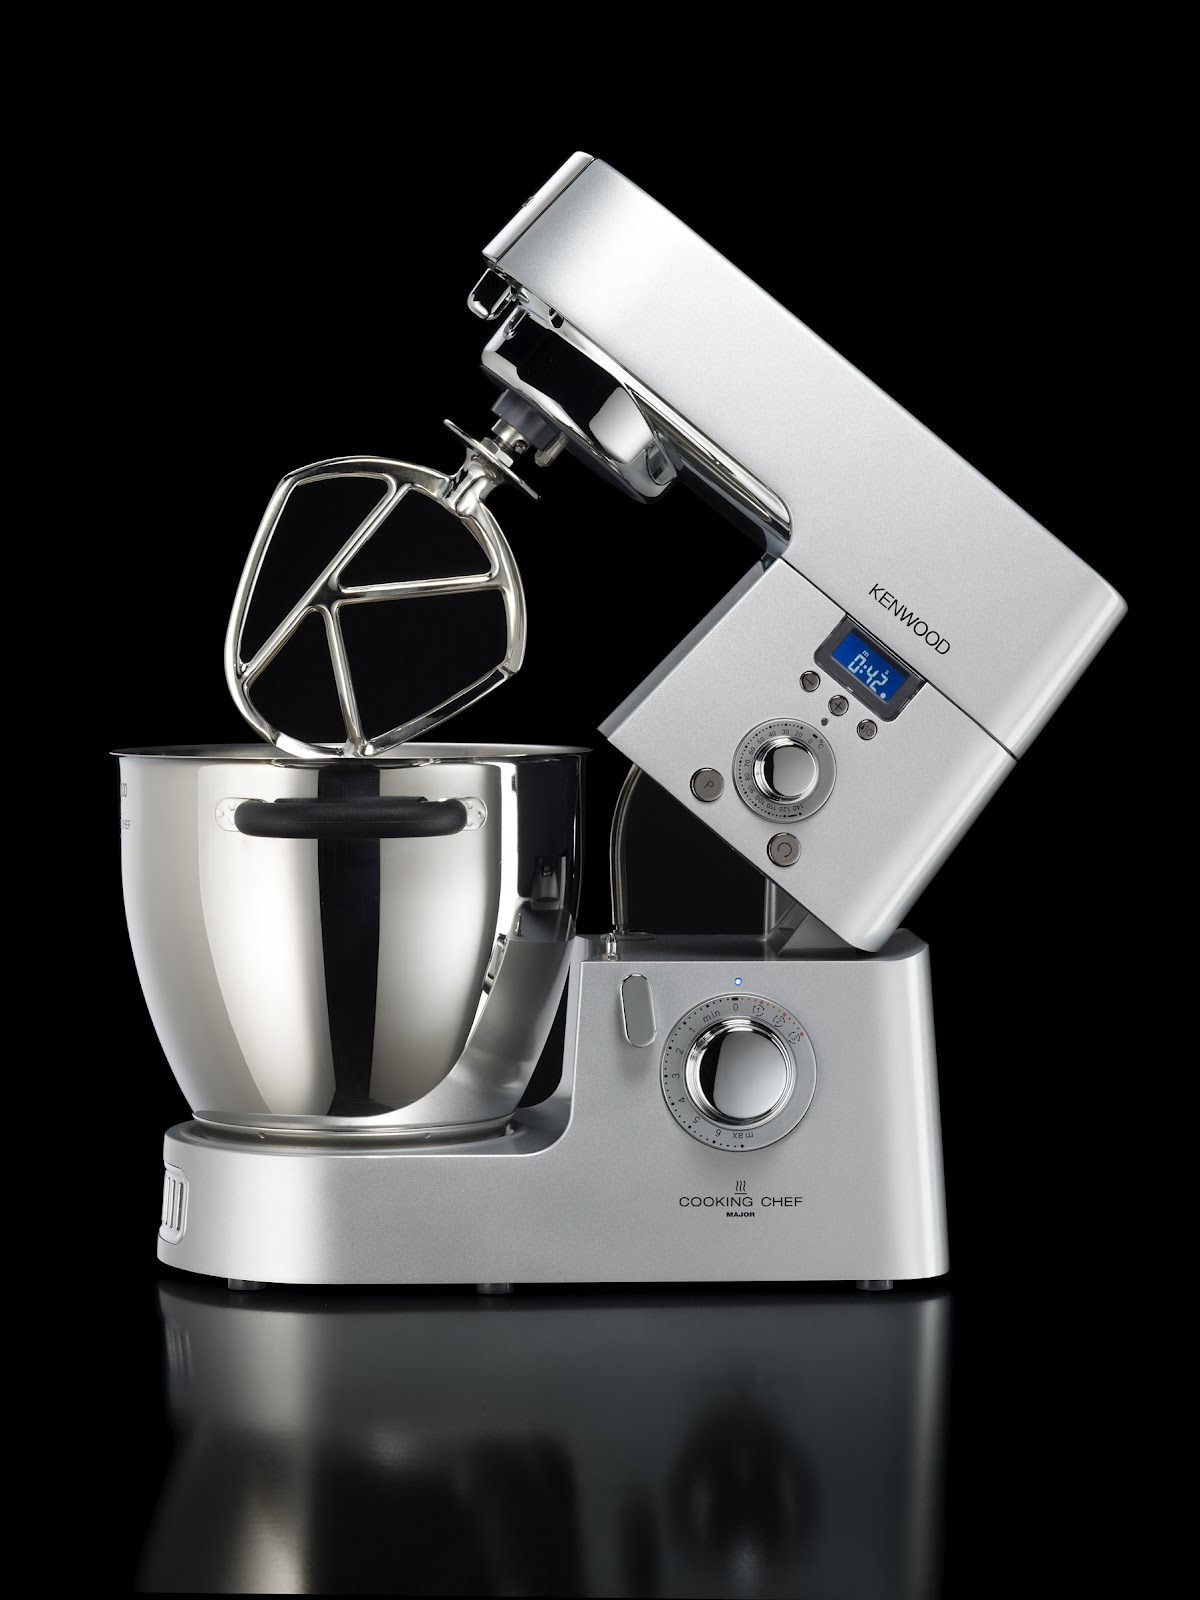 Stunning Robot Cucina Kenwood Cooking Chef Ideas - Home Interior ...